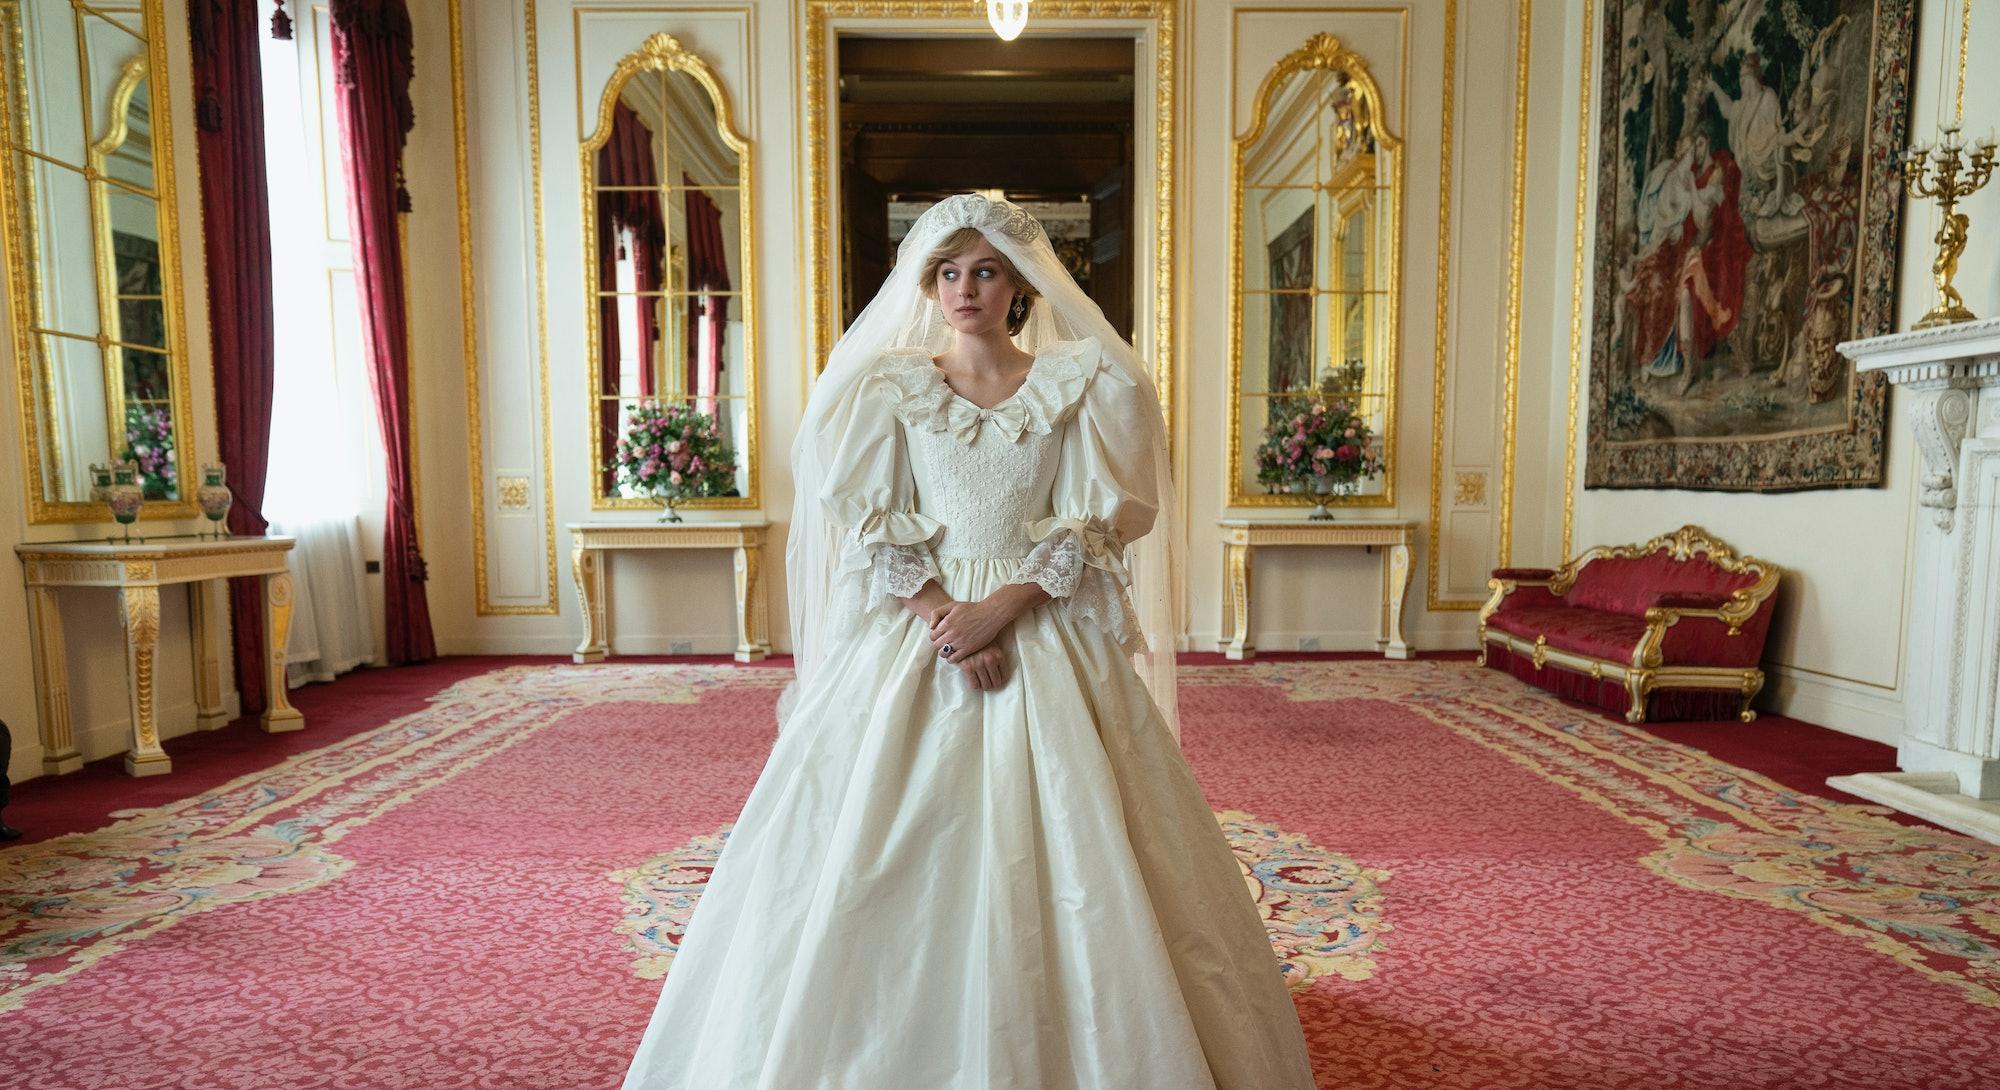 Emma Corrin as Princess Diana in 'The Crown' via the Netflix press site.